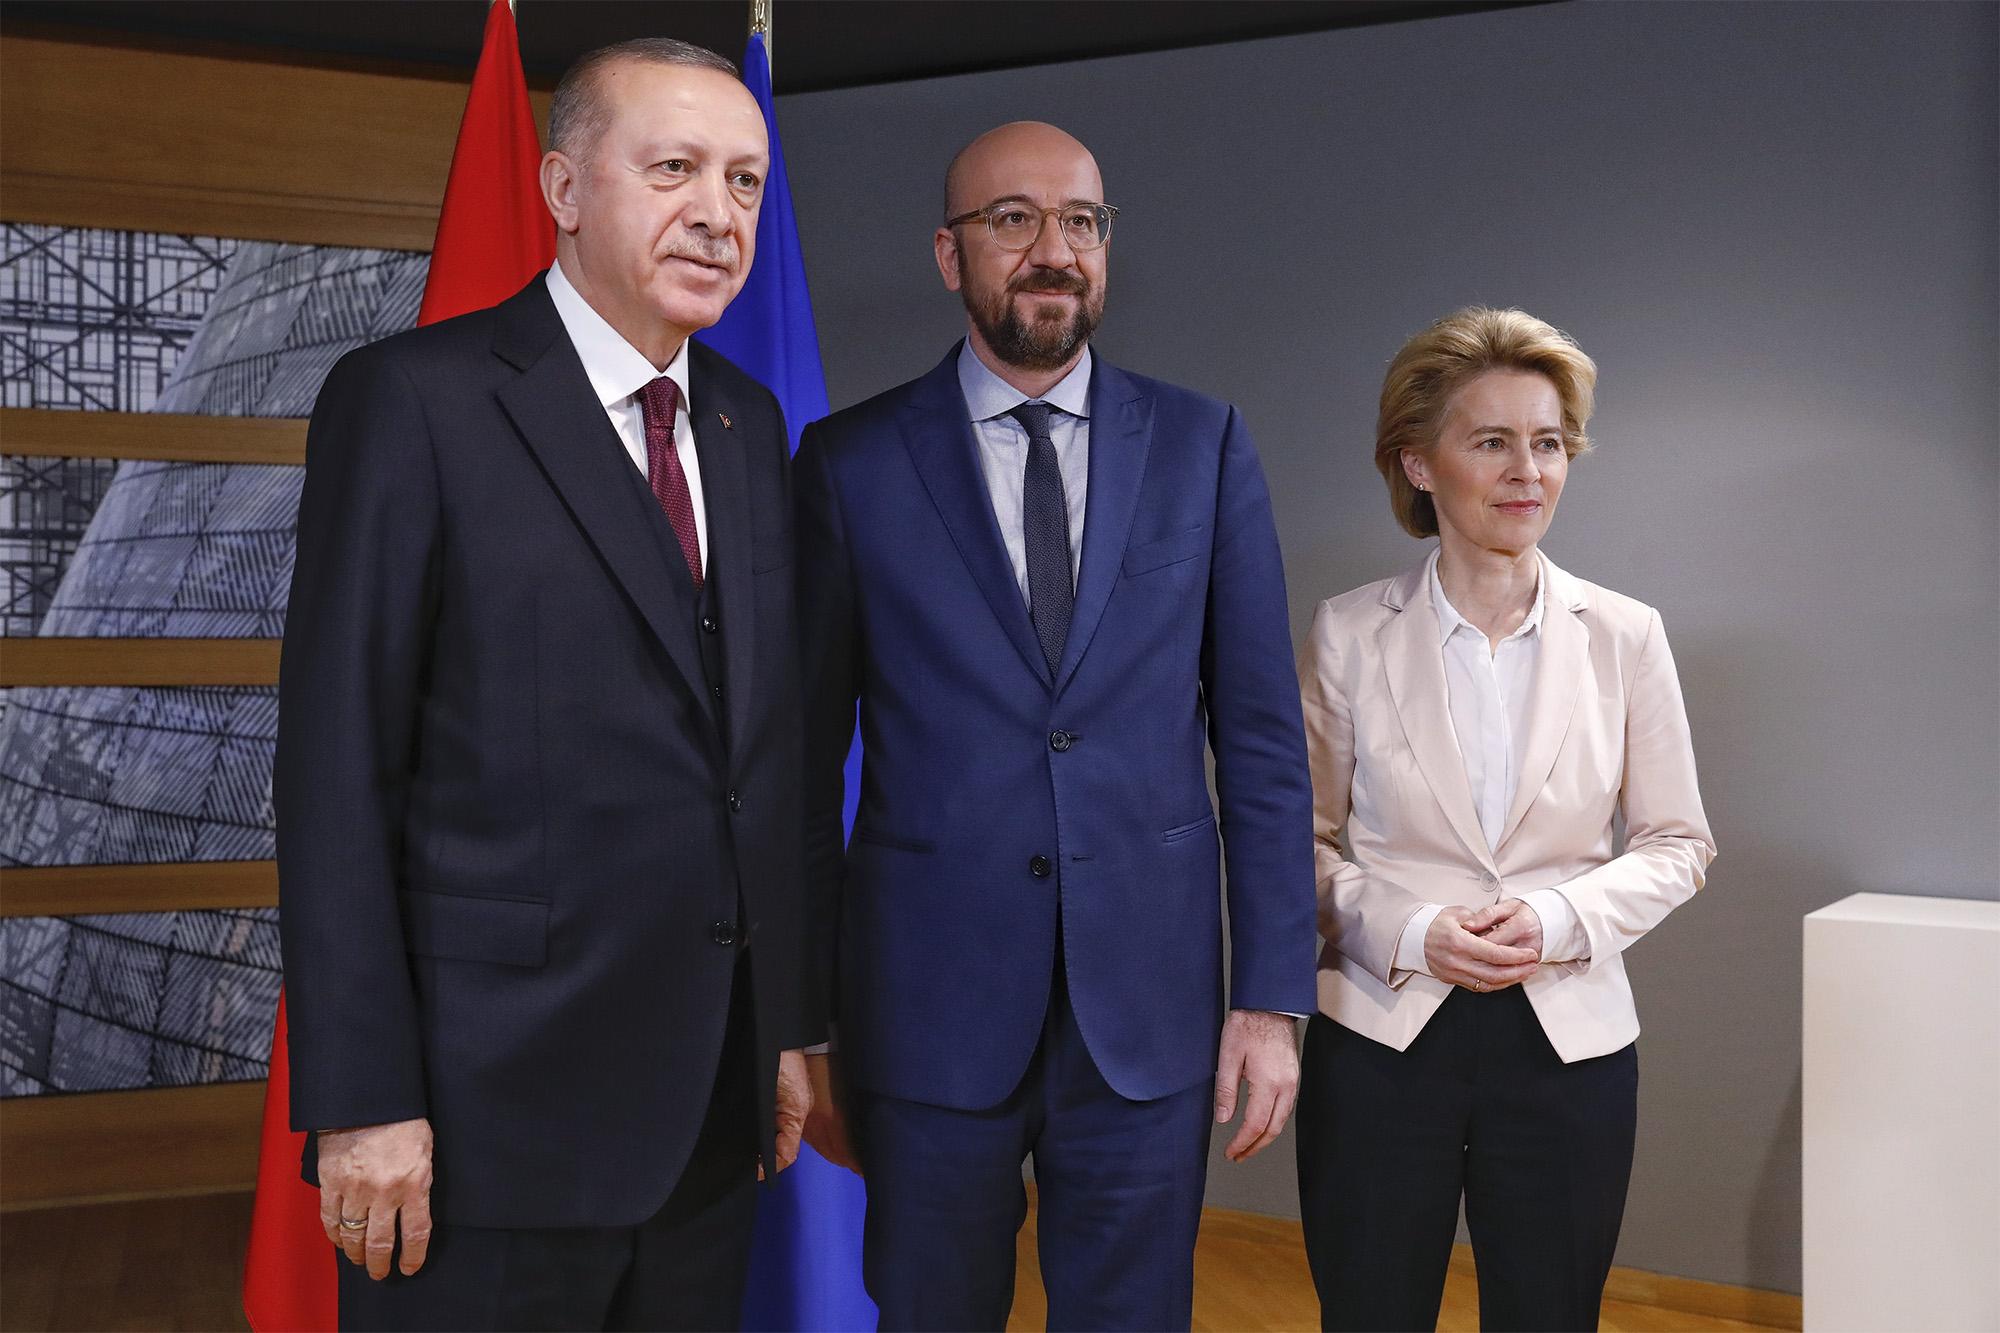 Da esquerda para a direita: Recep Tayyip Erdoğan, Presidente da Turquia; Charles Michel, Presidente do Conselho Europeu; Ursula Von der Leyen, Presidente da Comissão Europeia/ © European Union.